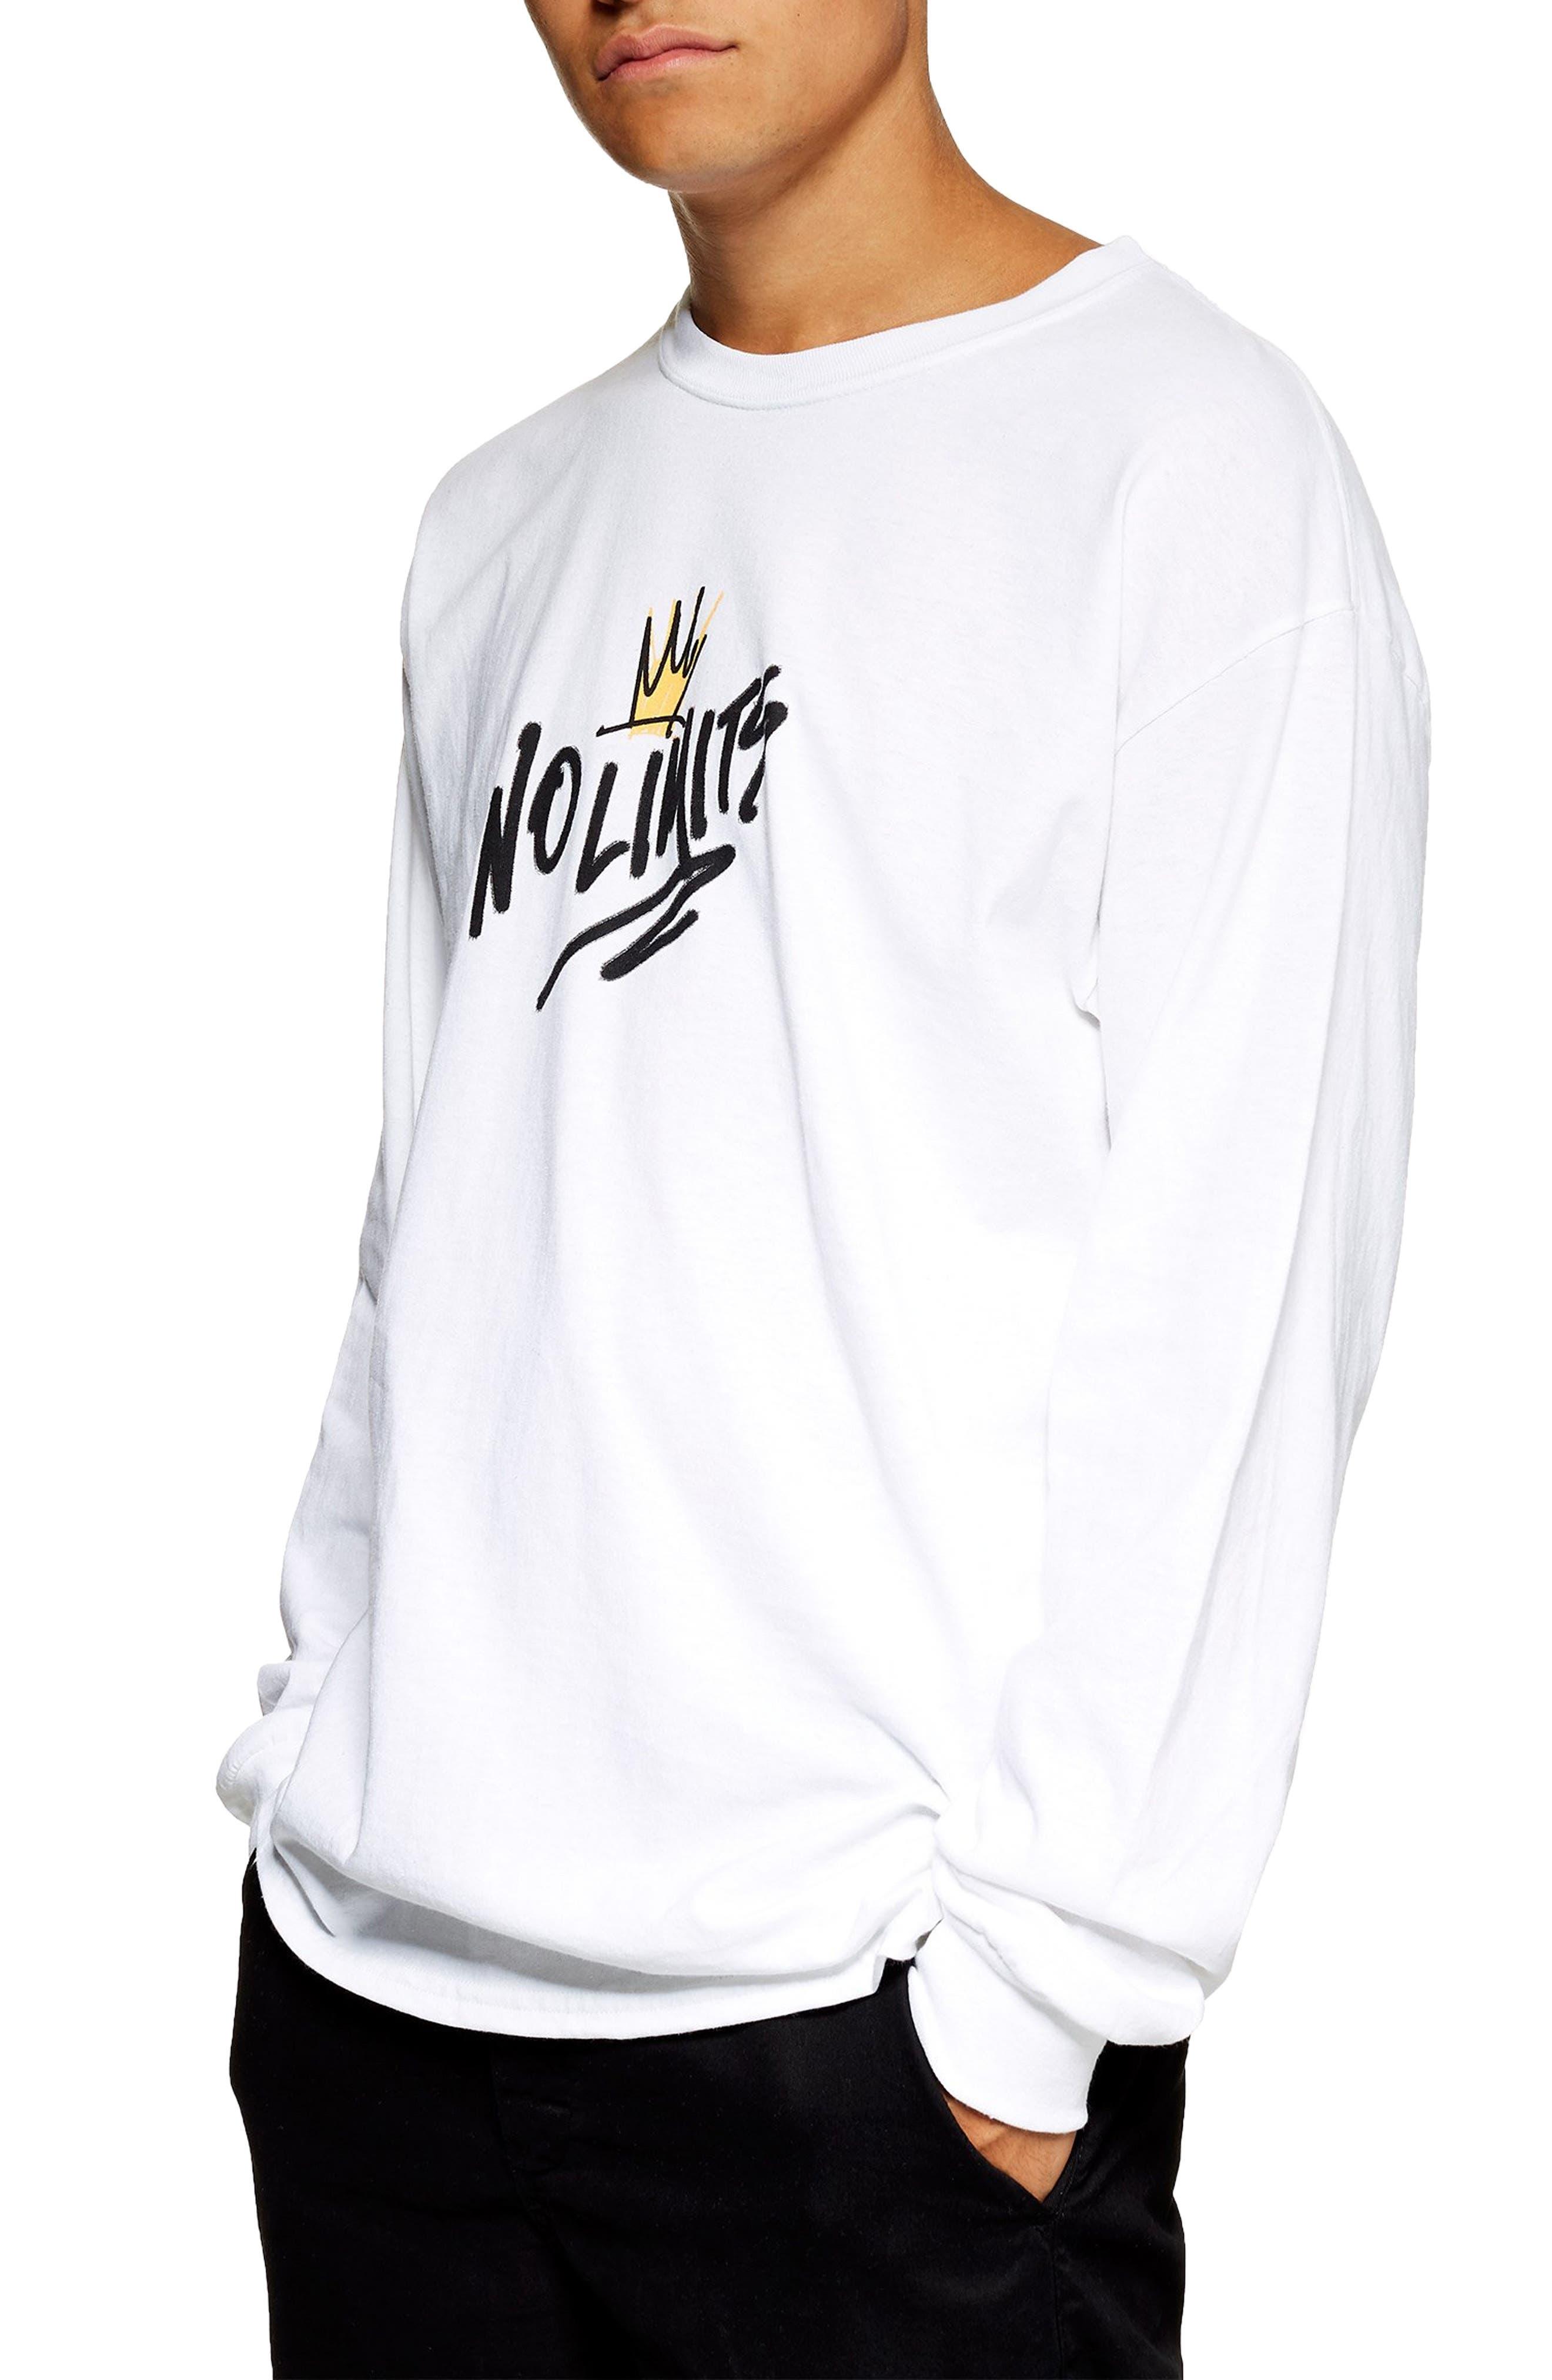 No Limits Graphic T-Shirt,                             Main thumbnail 1, color,                             WHITE MULTI